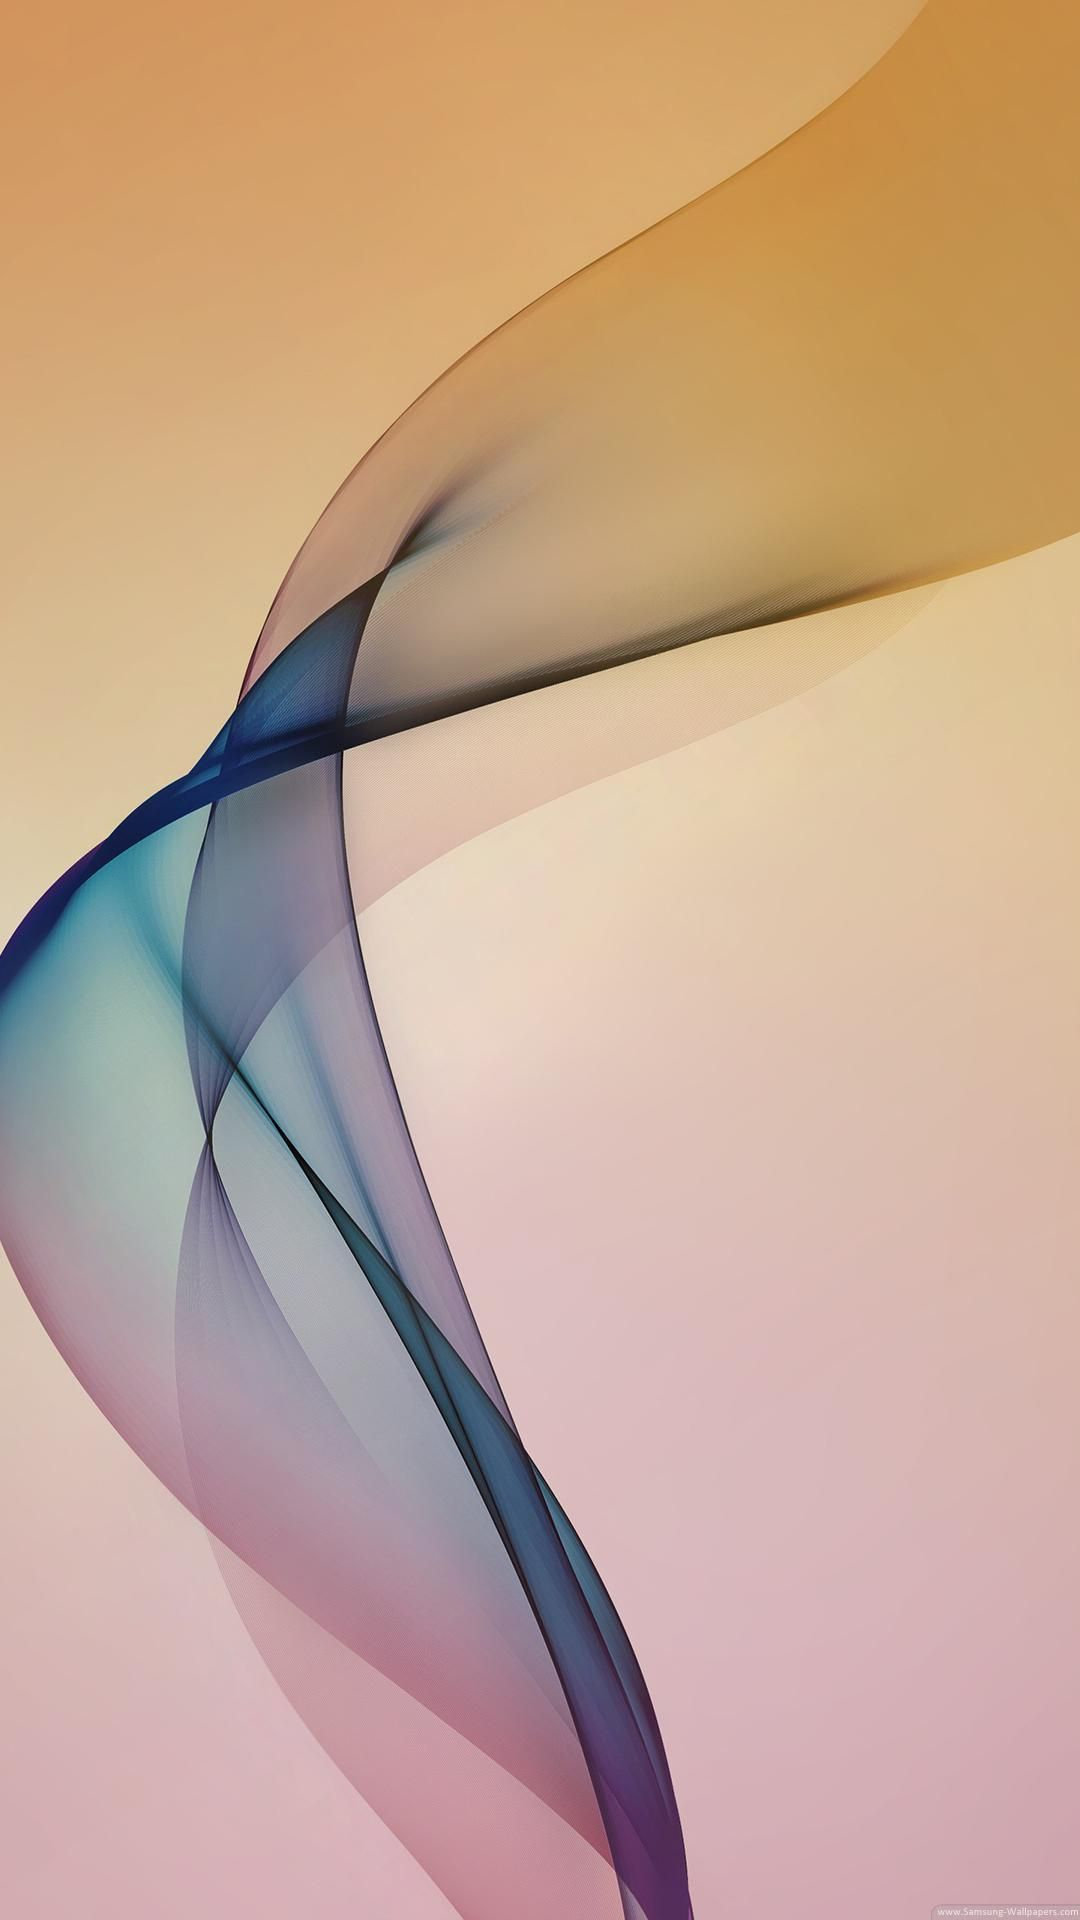 Samsung Galaxy J7 Prime 2 Wallpapers Beautiful Landscape Paintings Scenery Wallpaper Landscape Paintings